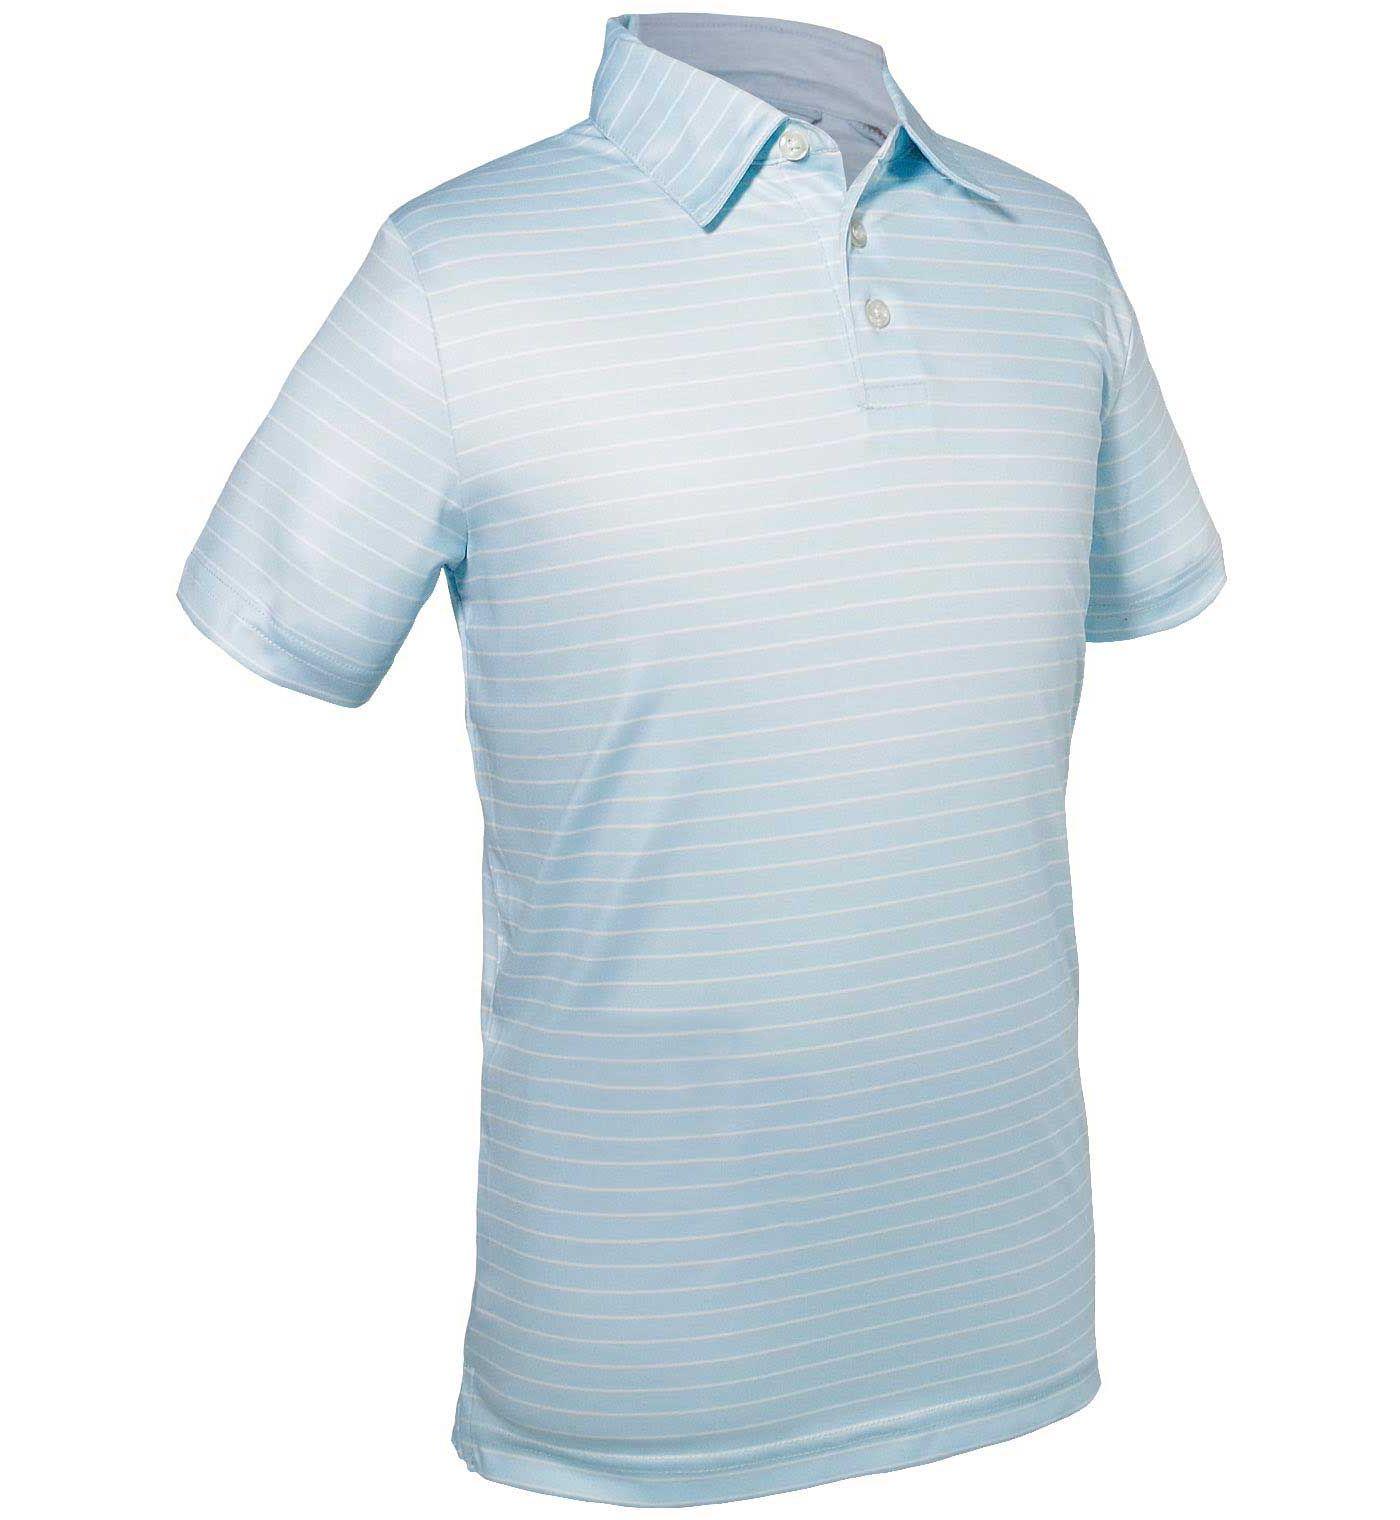 Garb Boys' Blake Golf Polo